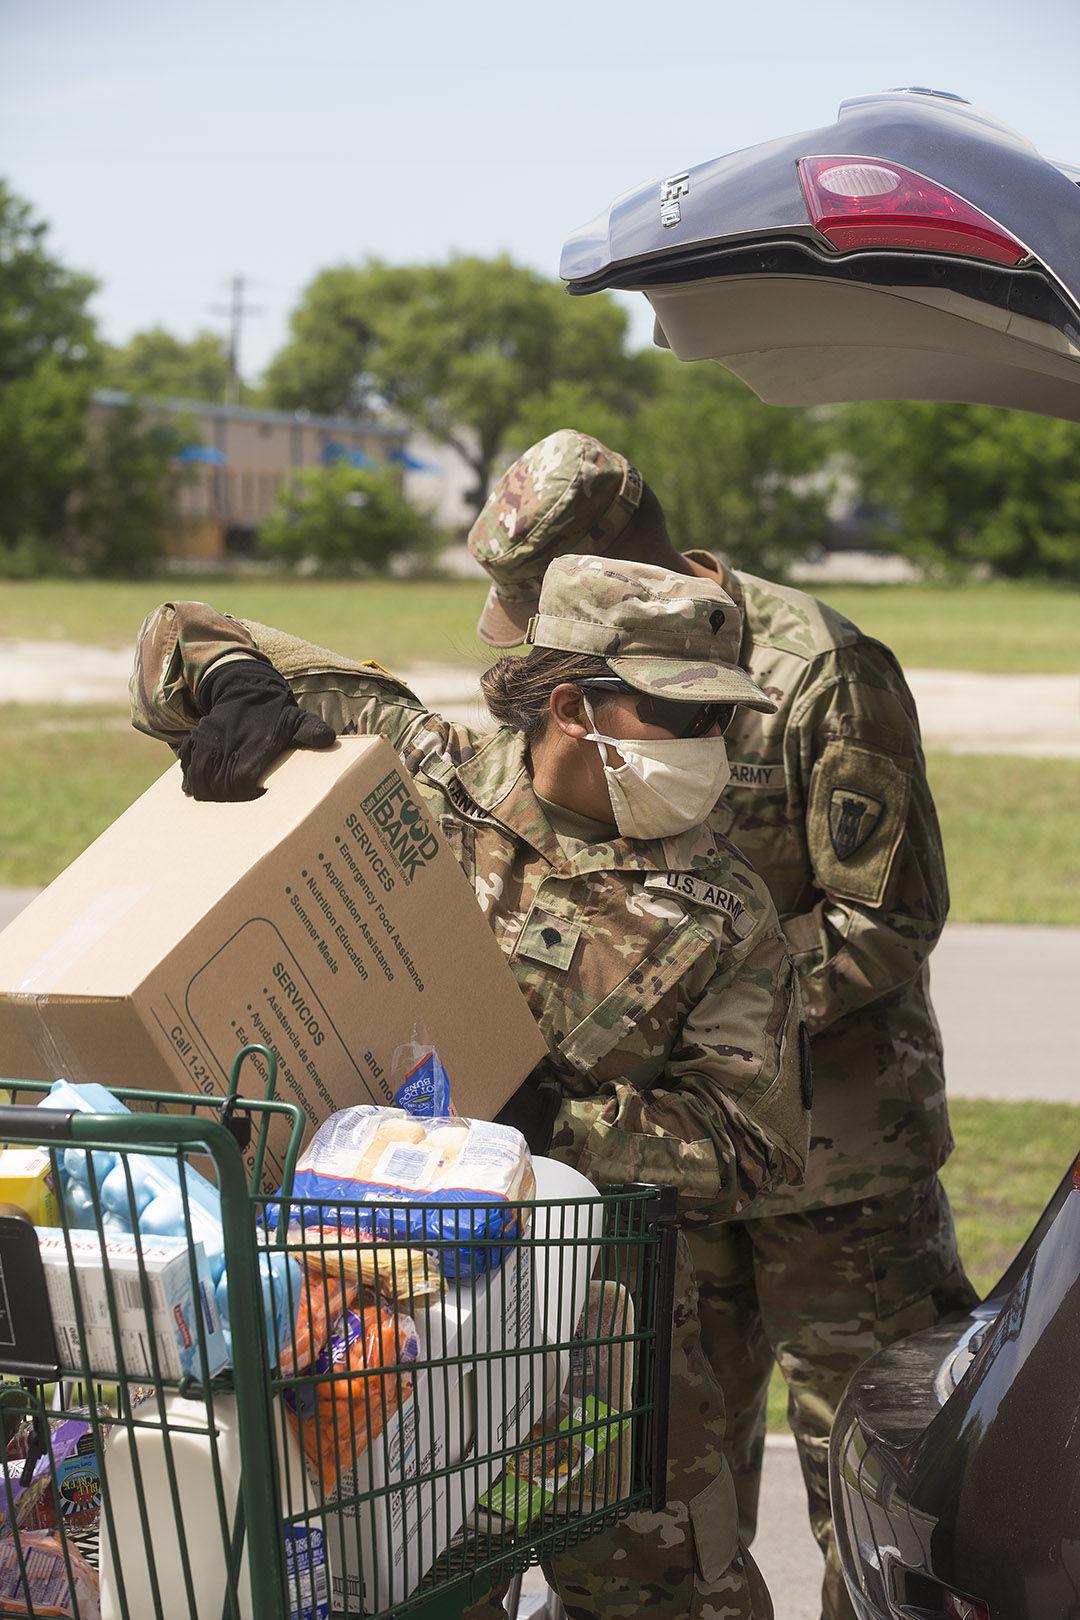 Texas Military Department Volunteers at Food Bank